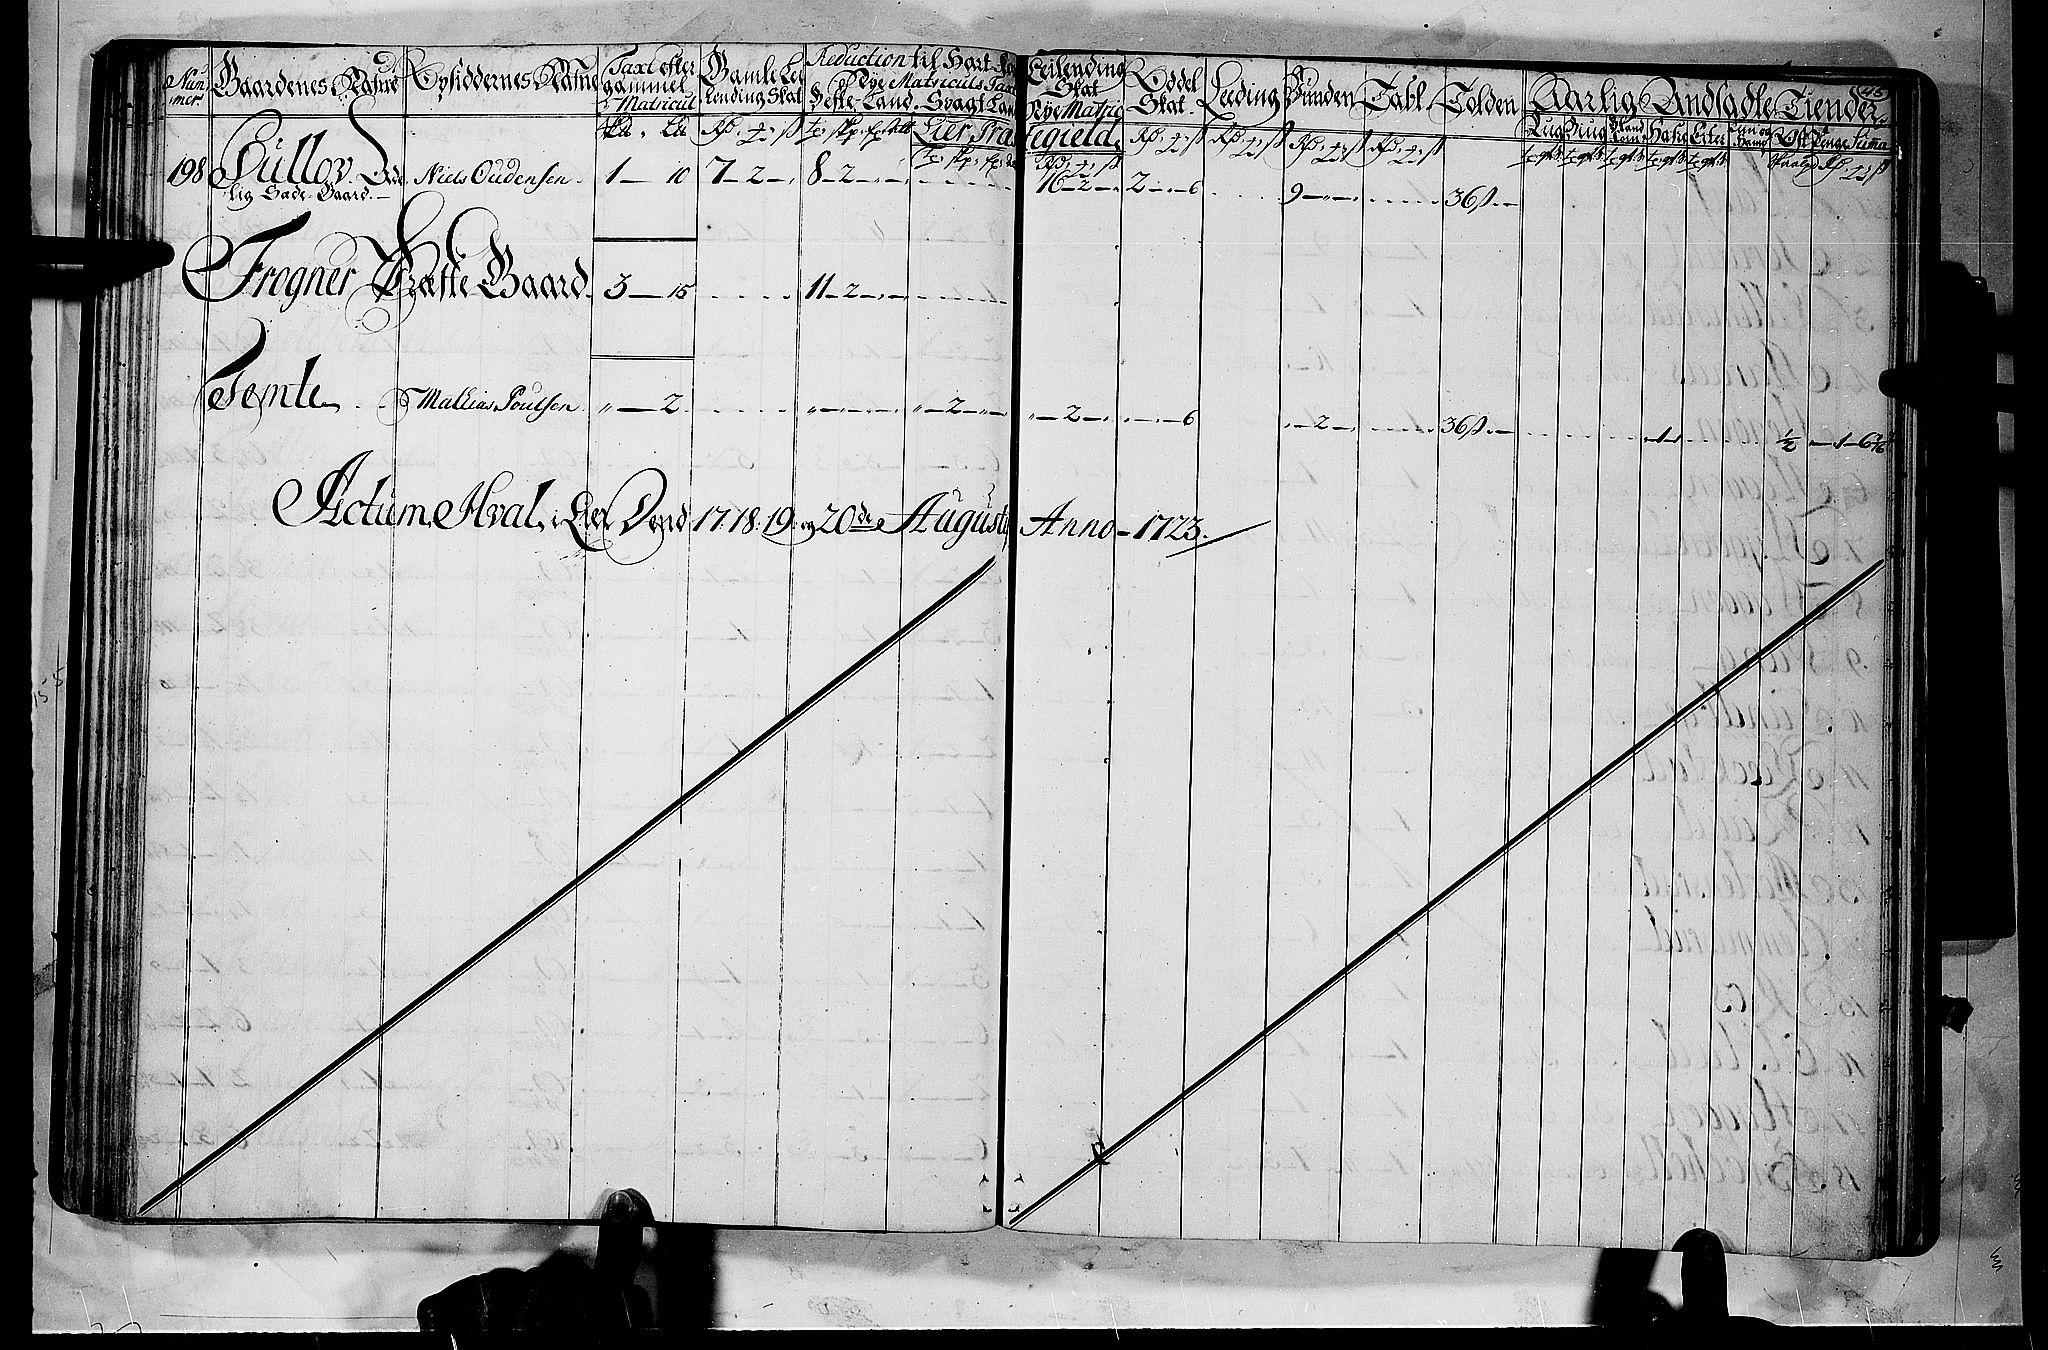 RA, Rentekammeret inntil 1814, Realistisk ordnet avdeling, N/Nb/Nbf/L0112: Buskerud matrikkelprotokoll, 1723, p. 47